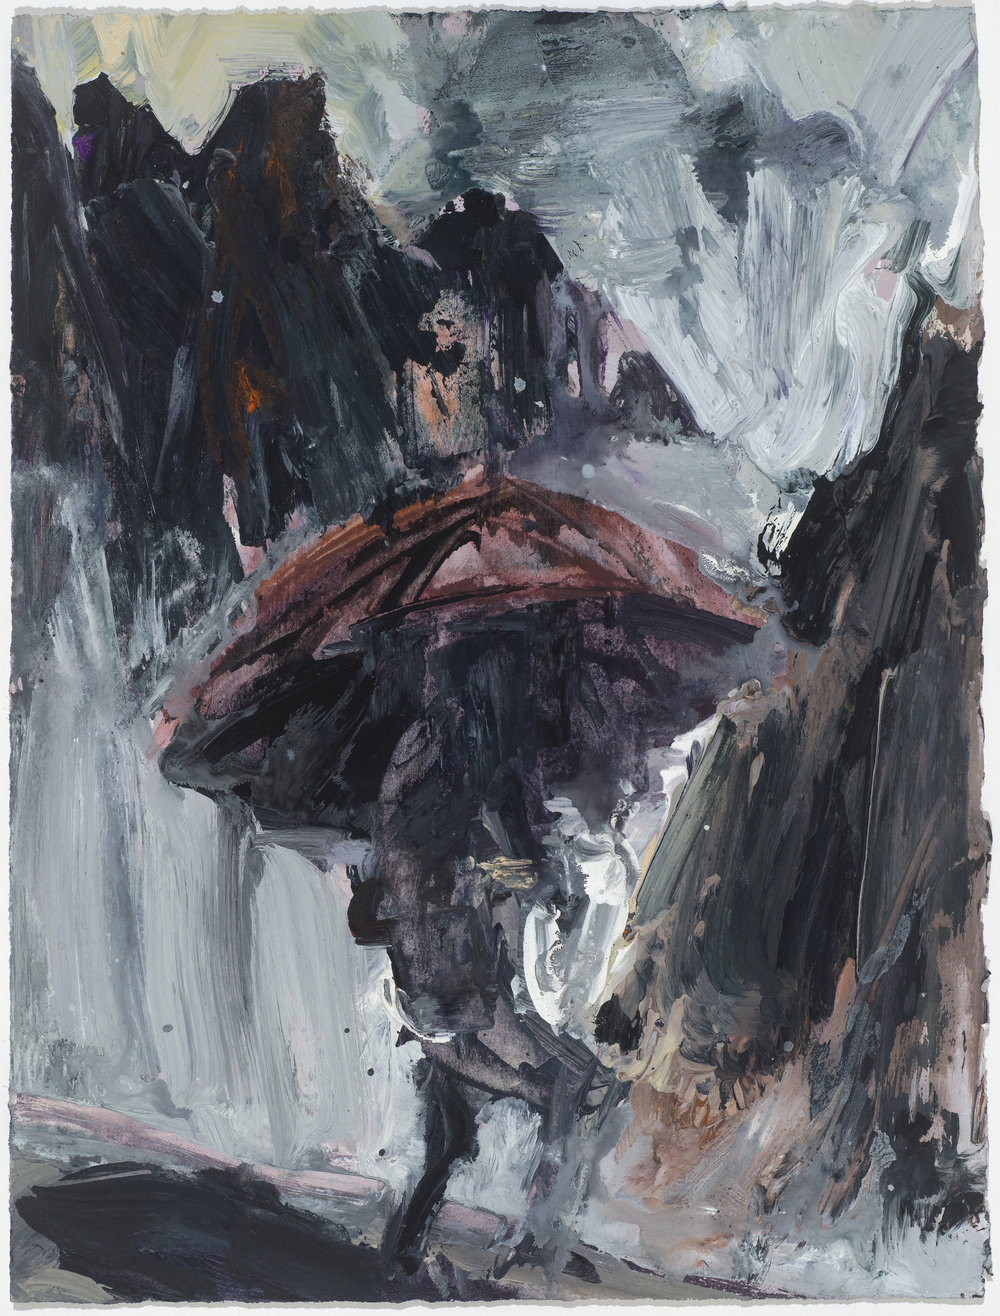 Red umbrella 10/16  紅傘10/16   Euan Macleod , 2016  Acrylic on paper, 40 x 30 cm, HKD 9,800 framed